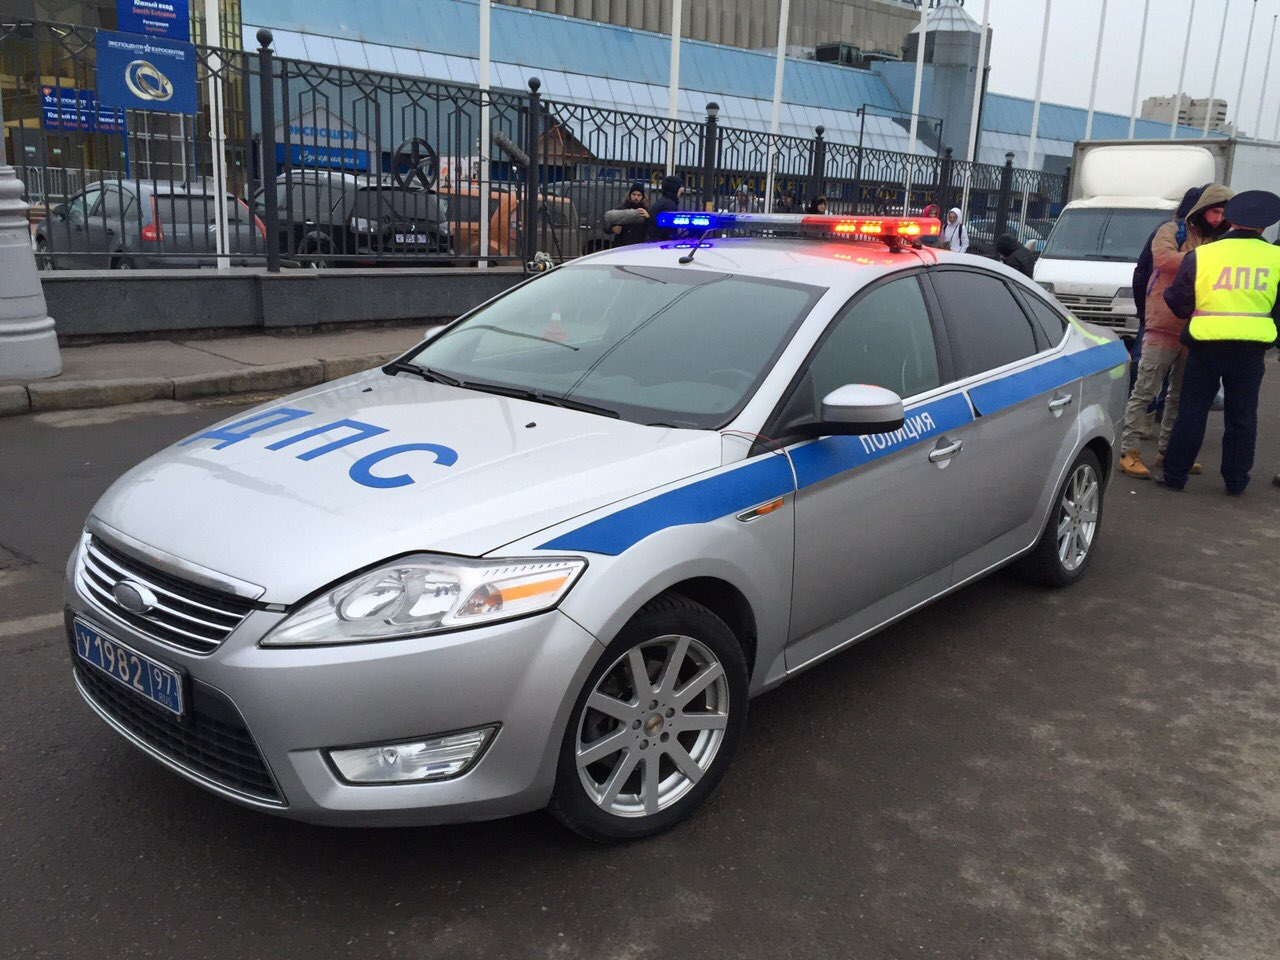 полиция ford mondeo ДПС 1000 4+1